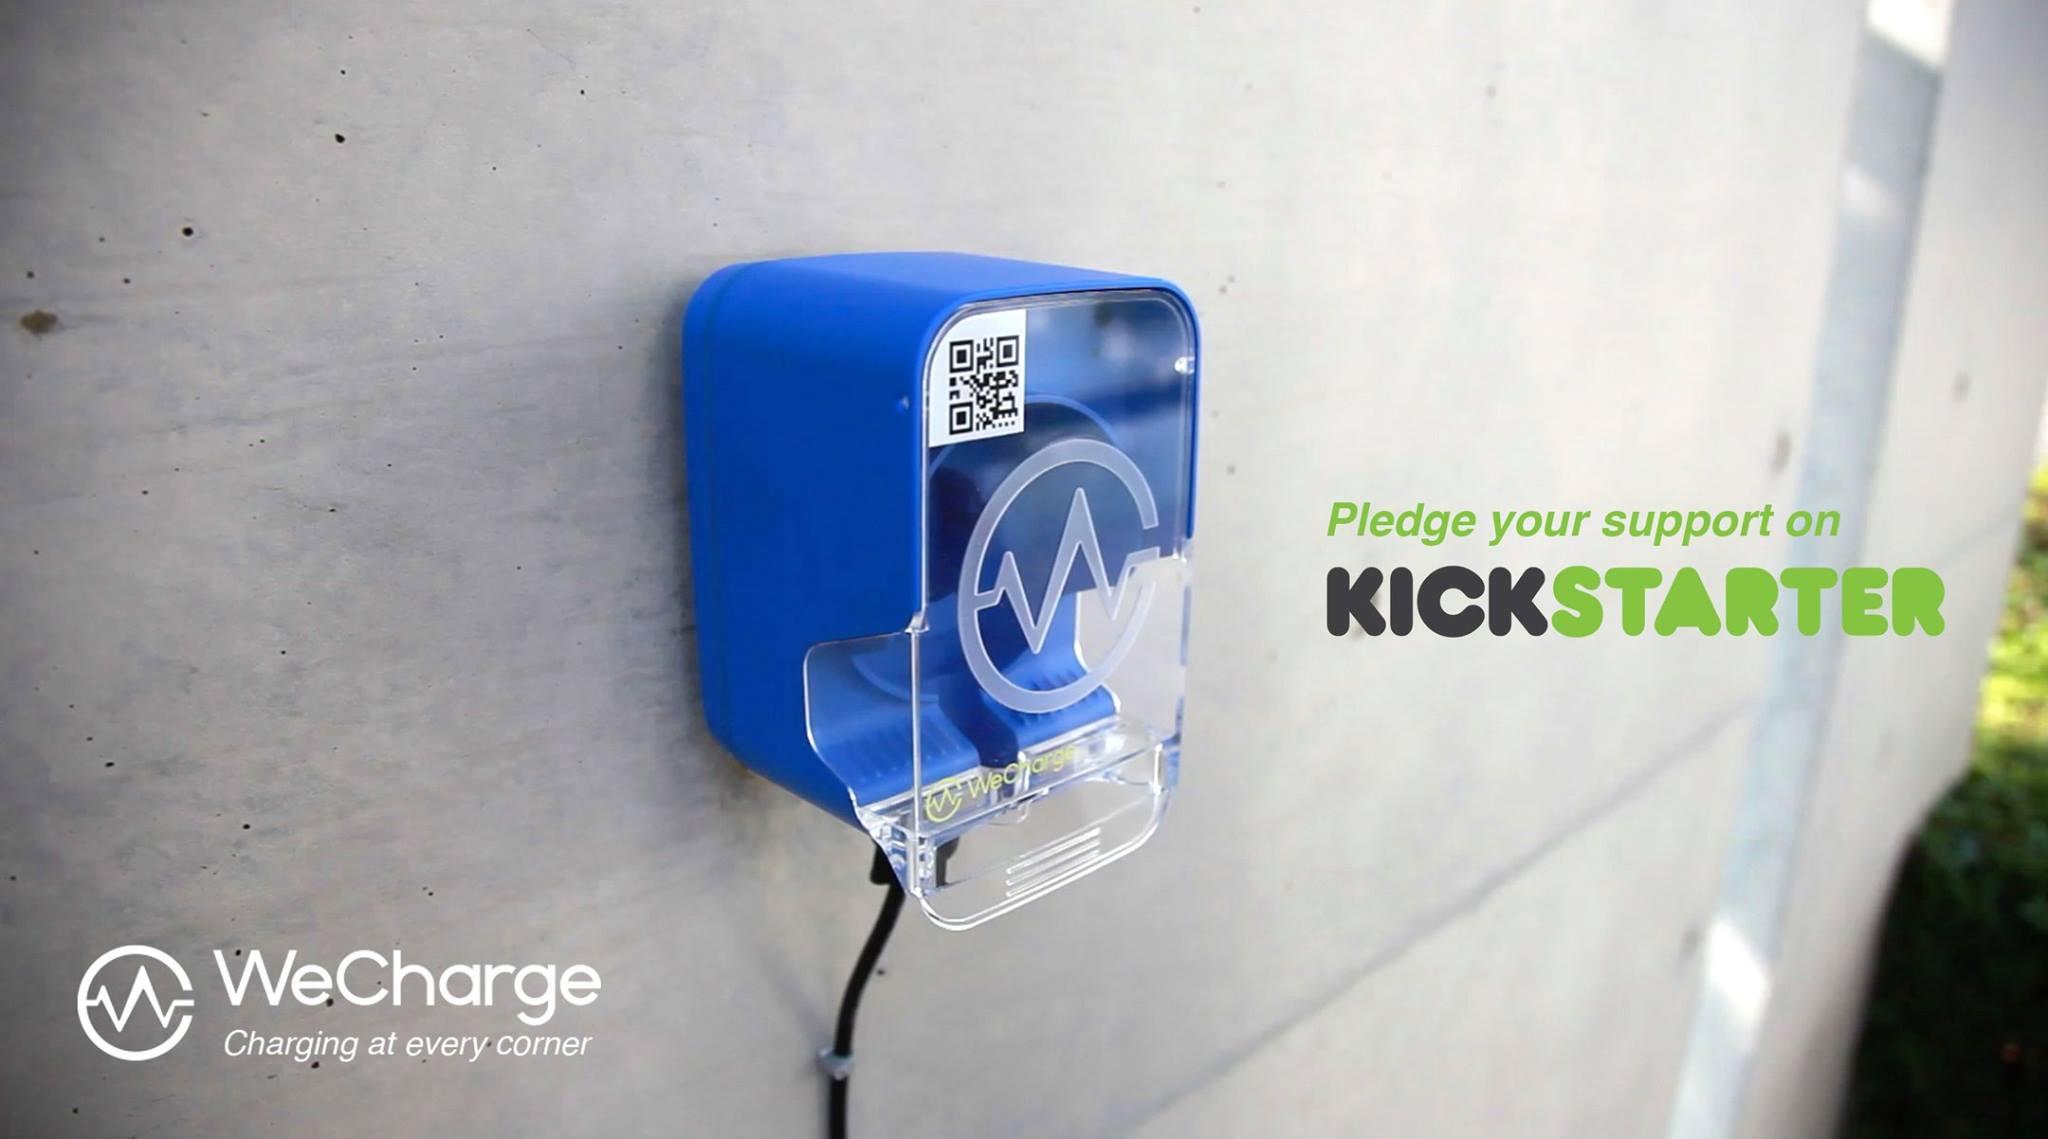 wecharge_kickstarter